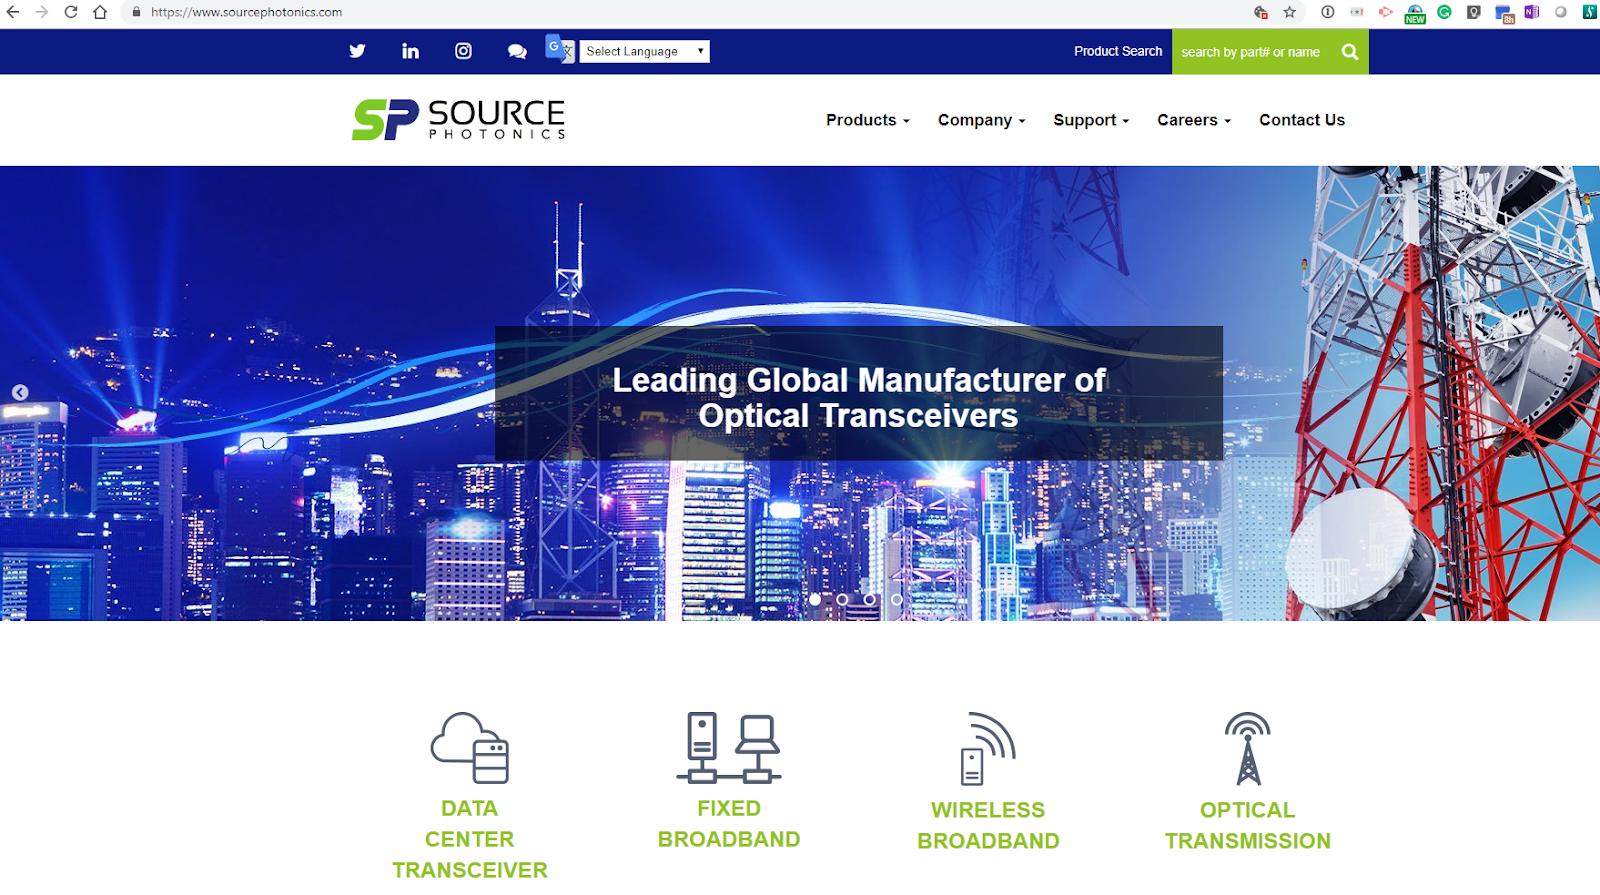 92da2a0eaf8 Source Photonics raises  100 million for its optical transceivers ...